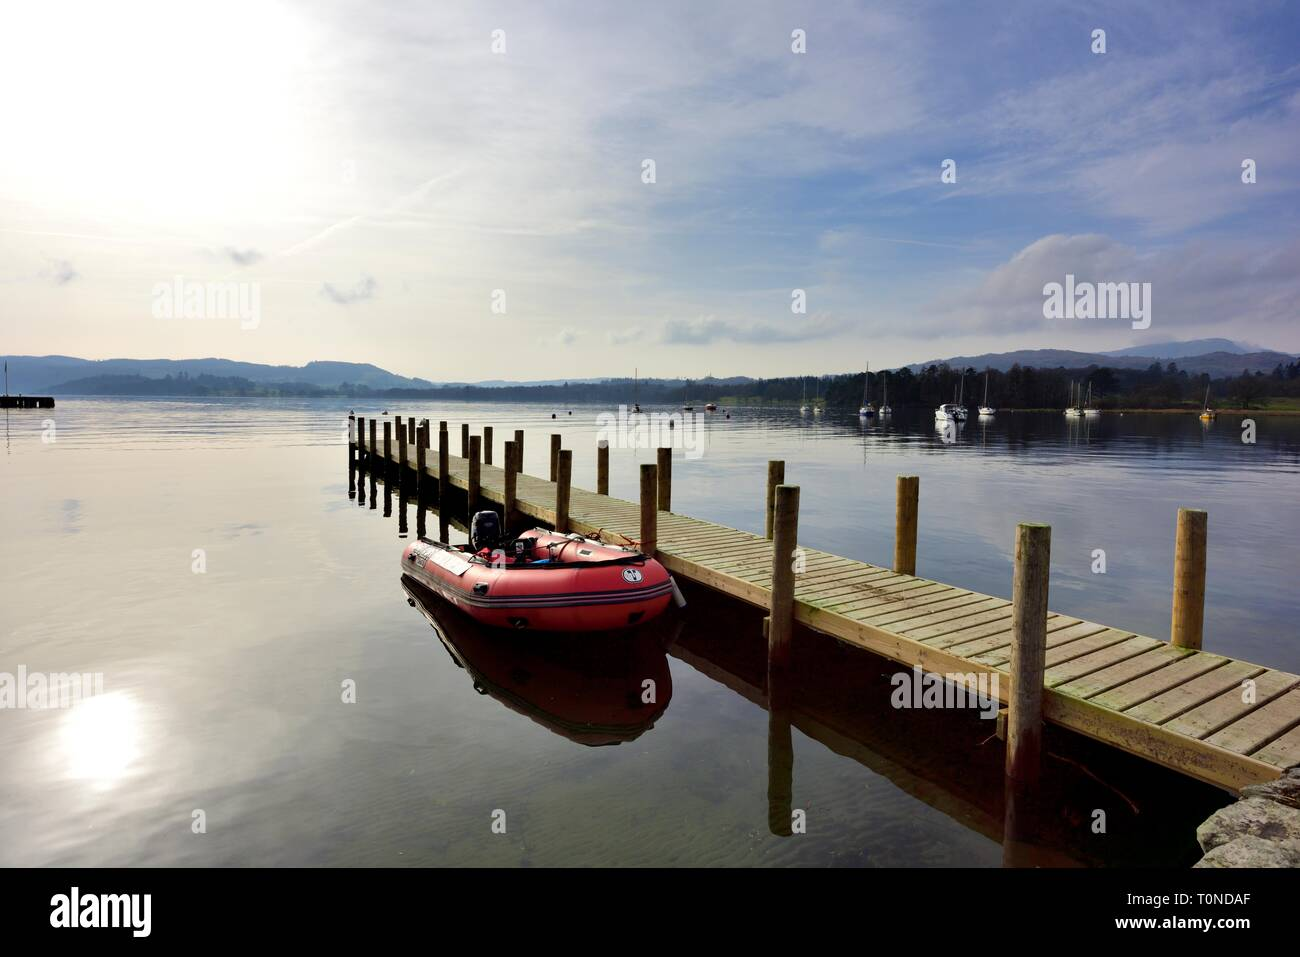 Inflatable speedboat,Waterhead,Ambleside,Lake Windermere,Lake District,Cumbria,England,UK Stock Photo